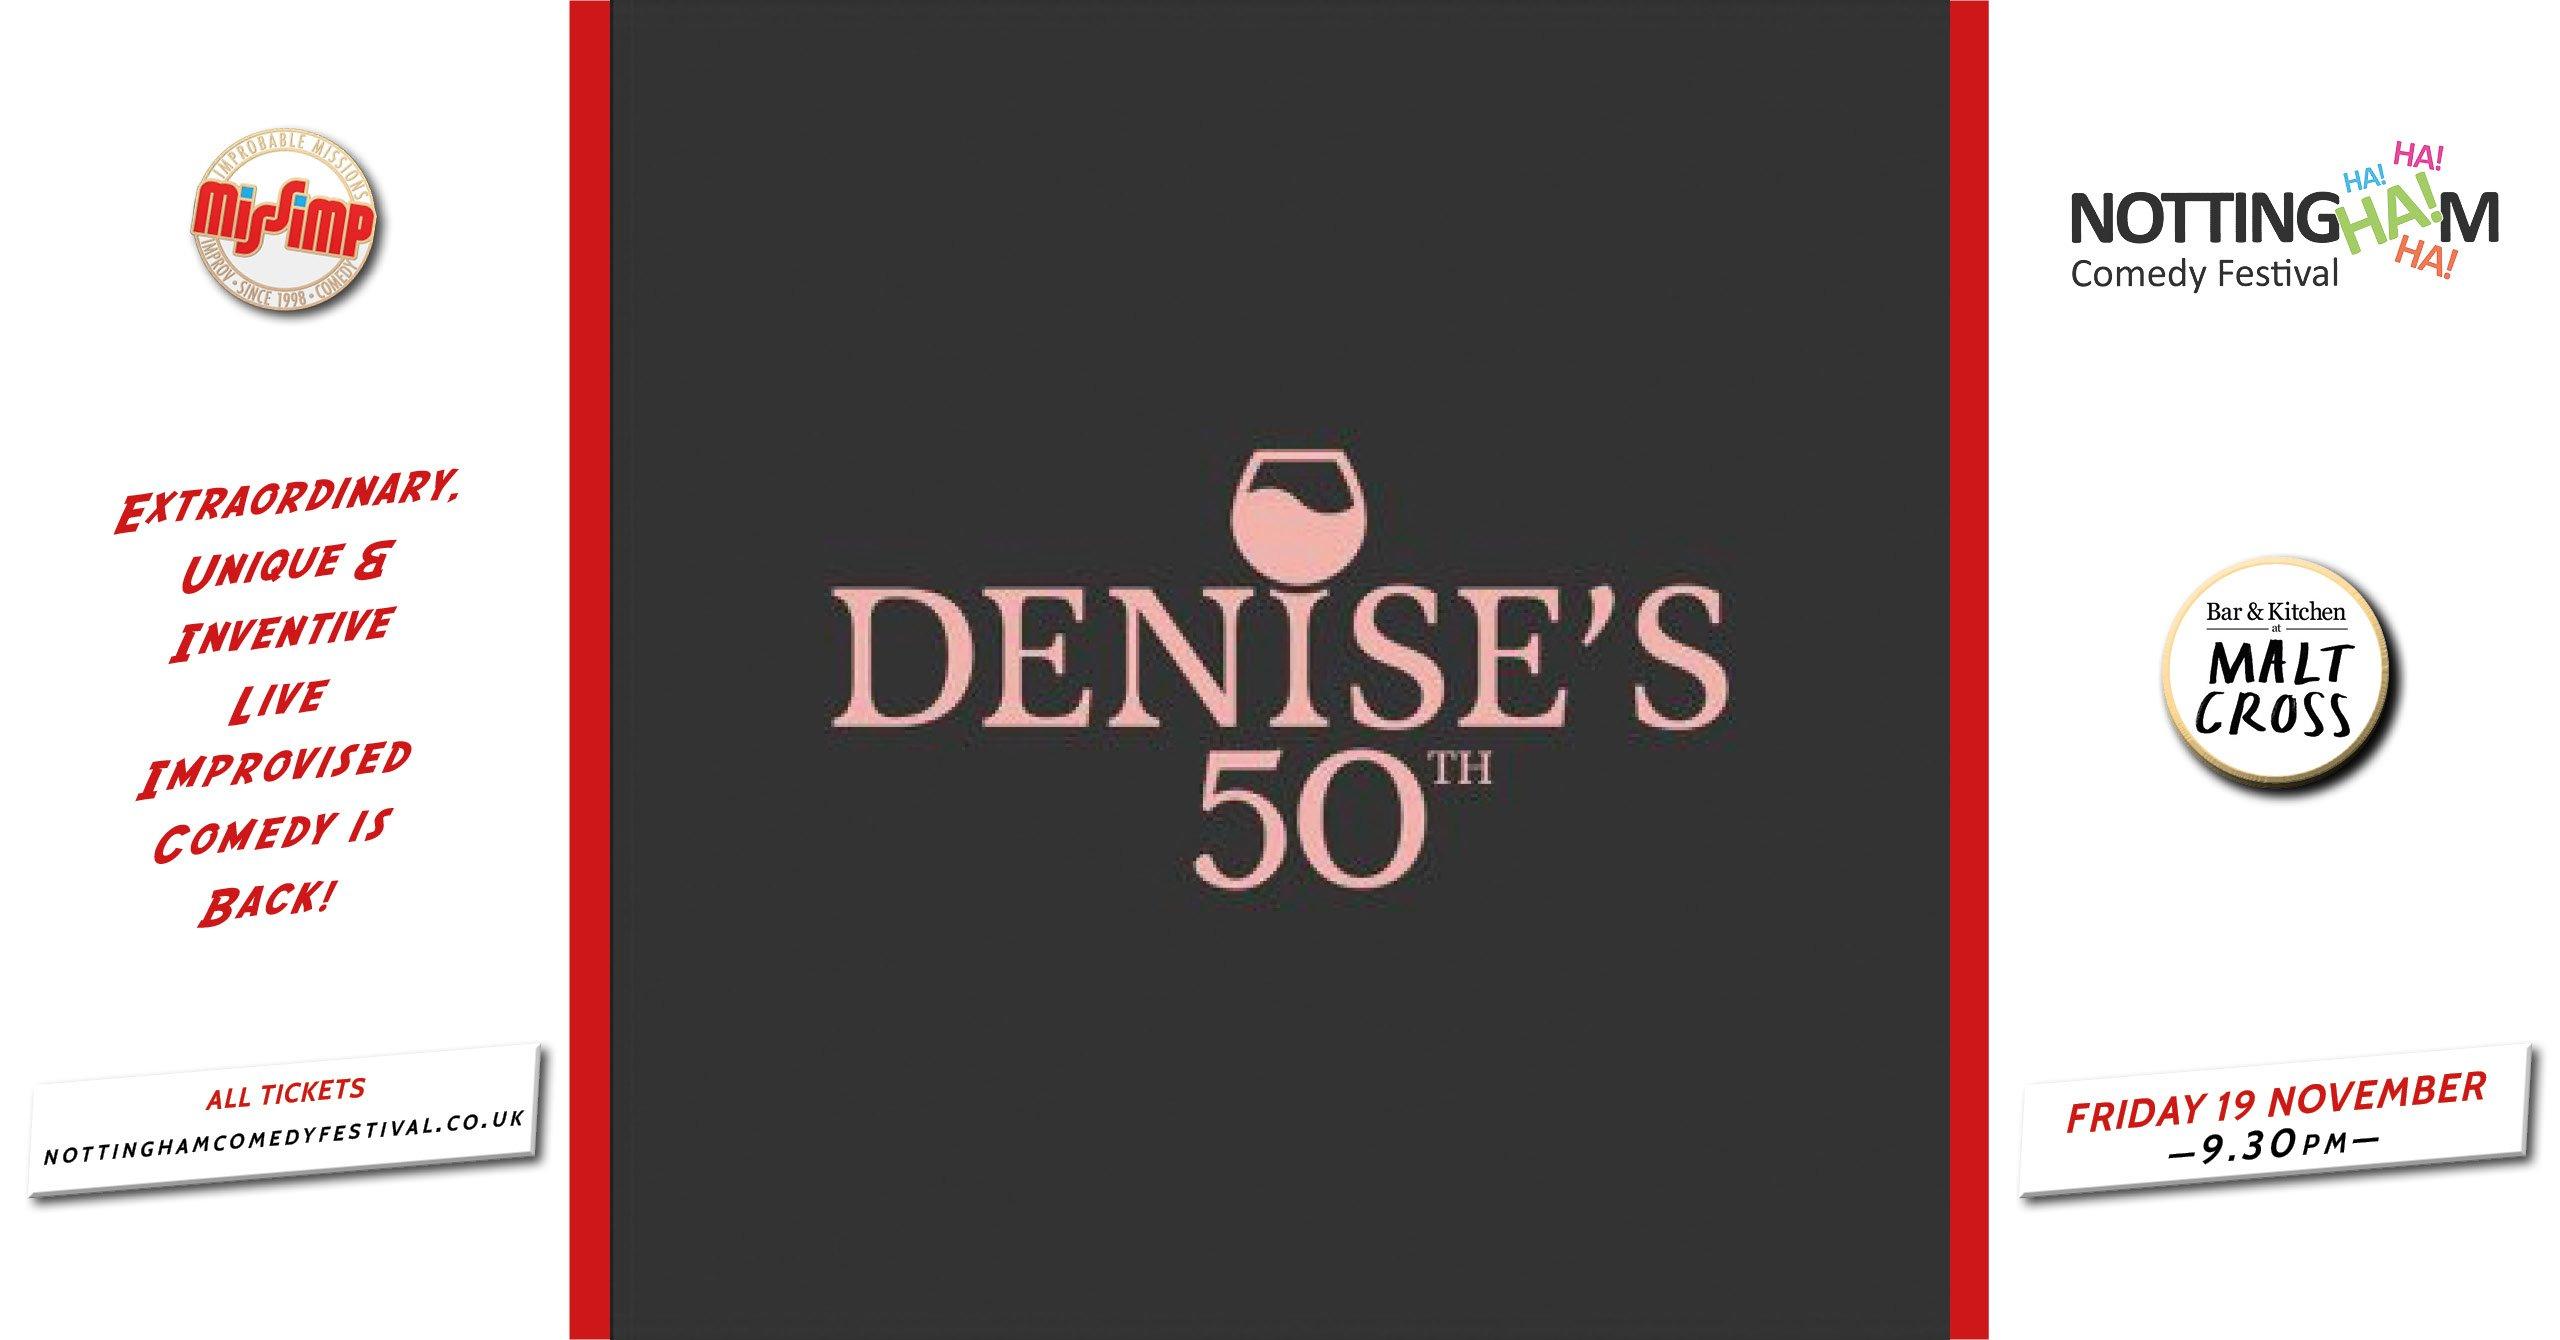 NCF2021 Denise's 50th